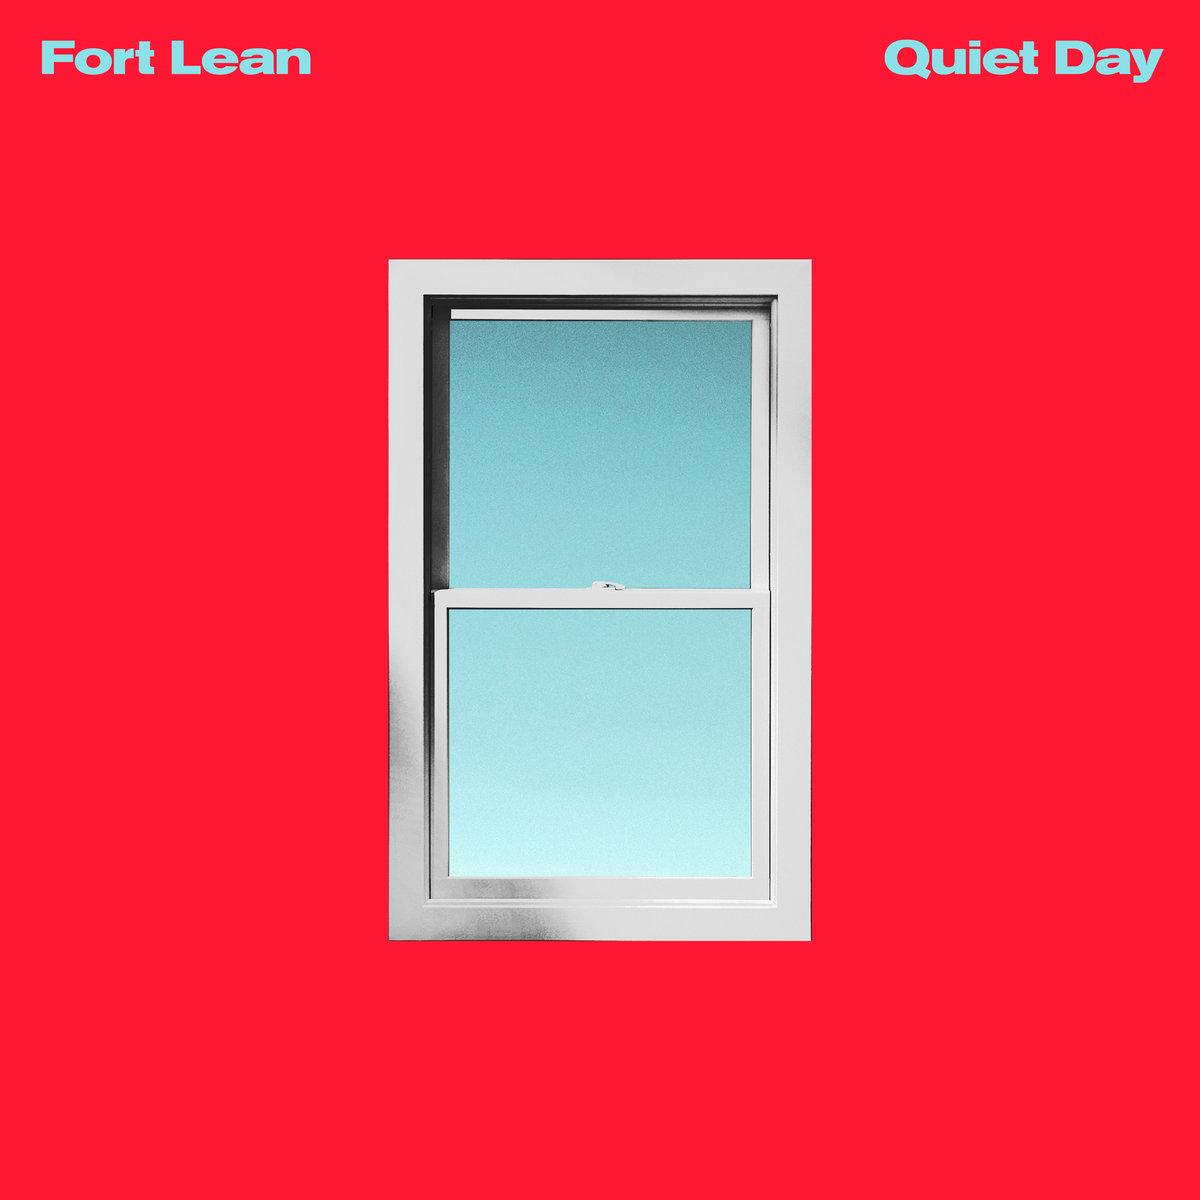 fort-lean-quiet-day